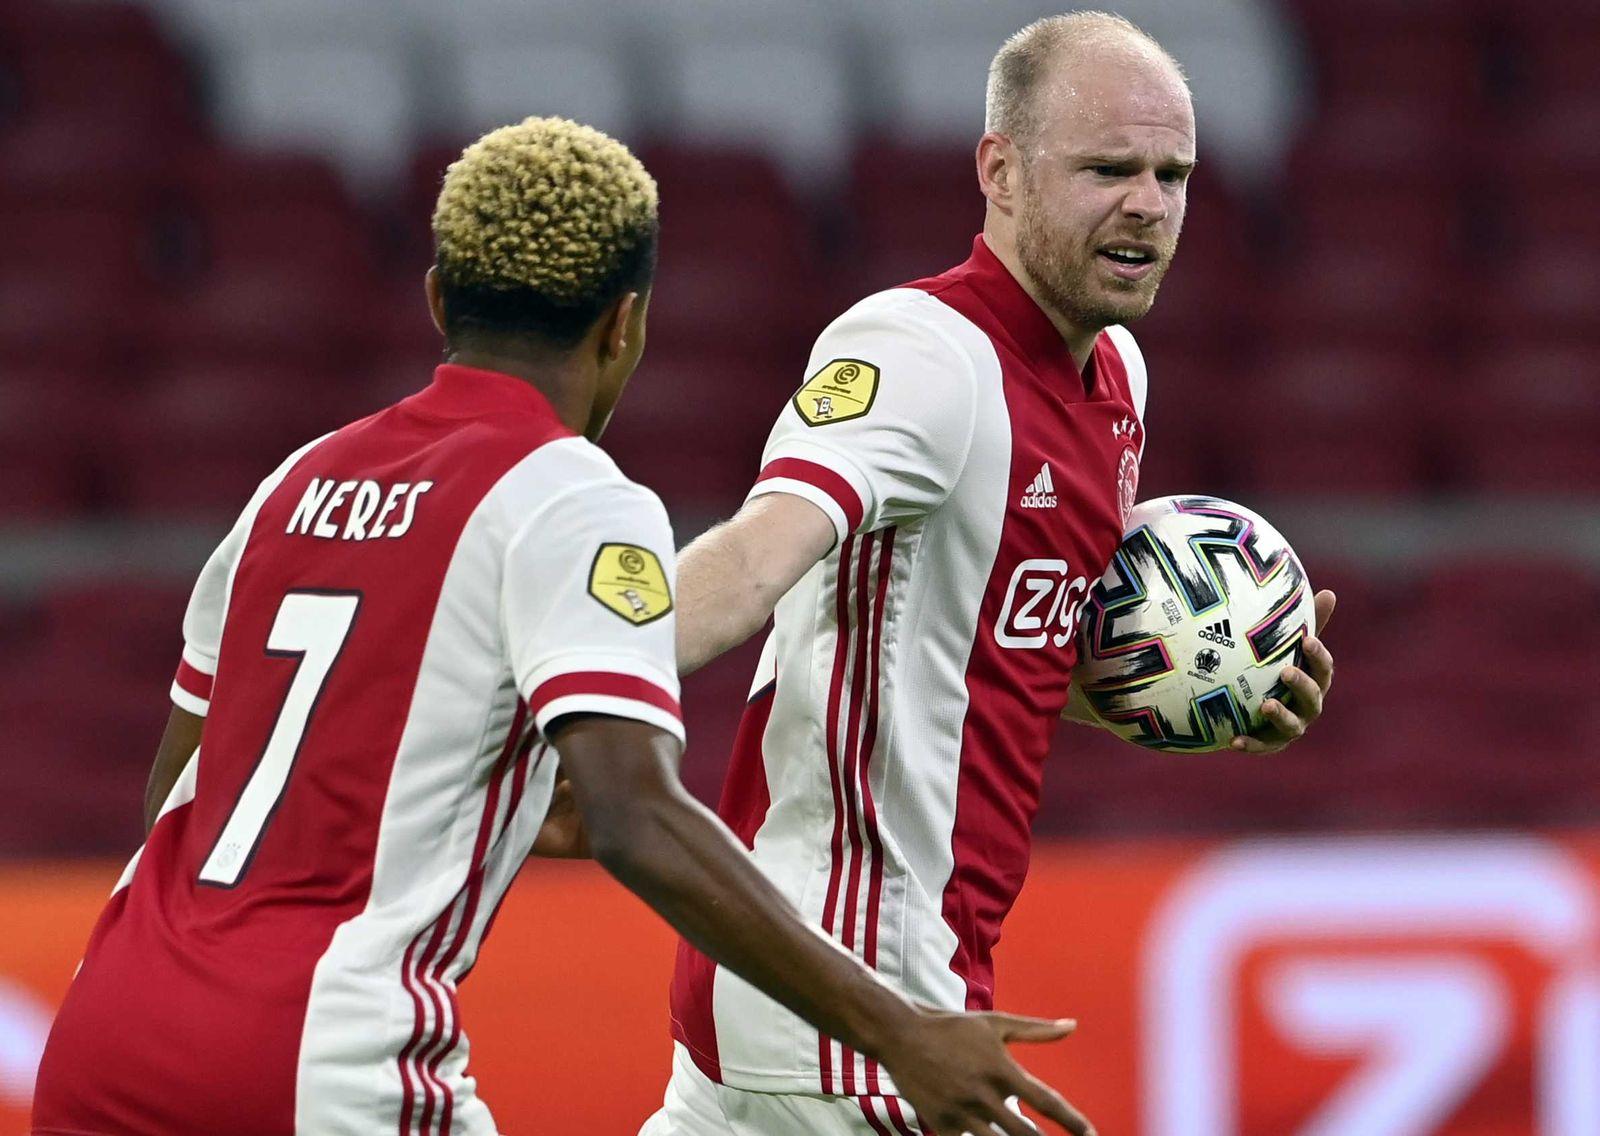 Ajax v Fortuna Sittard, Amsterdam, Netherlands - 31 Oct 2020